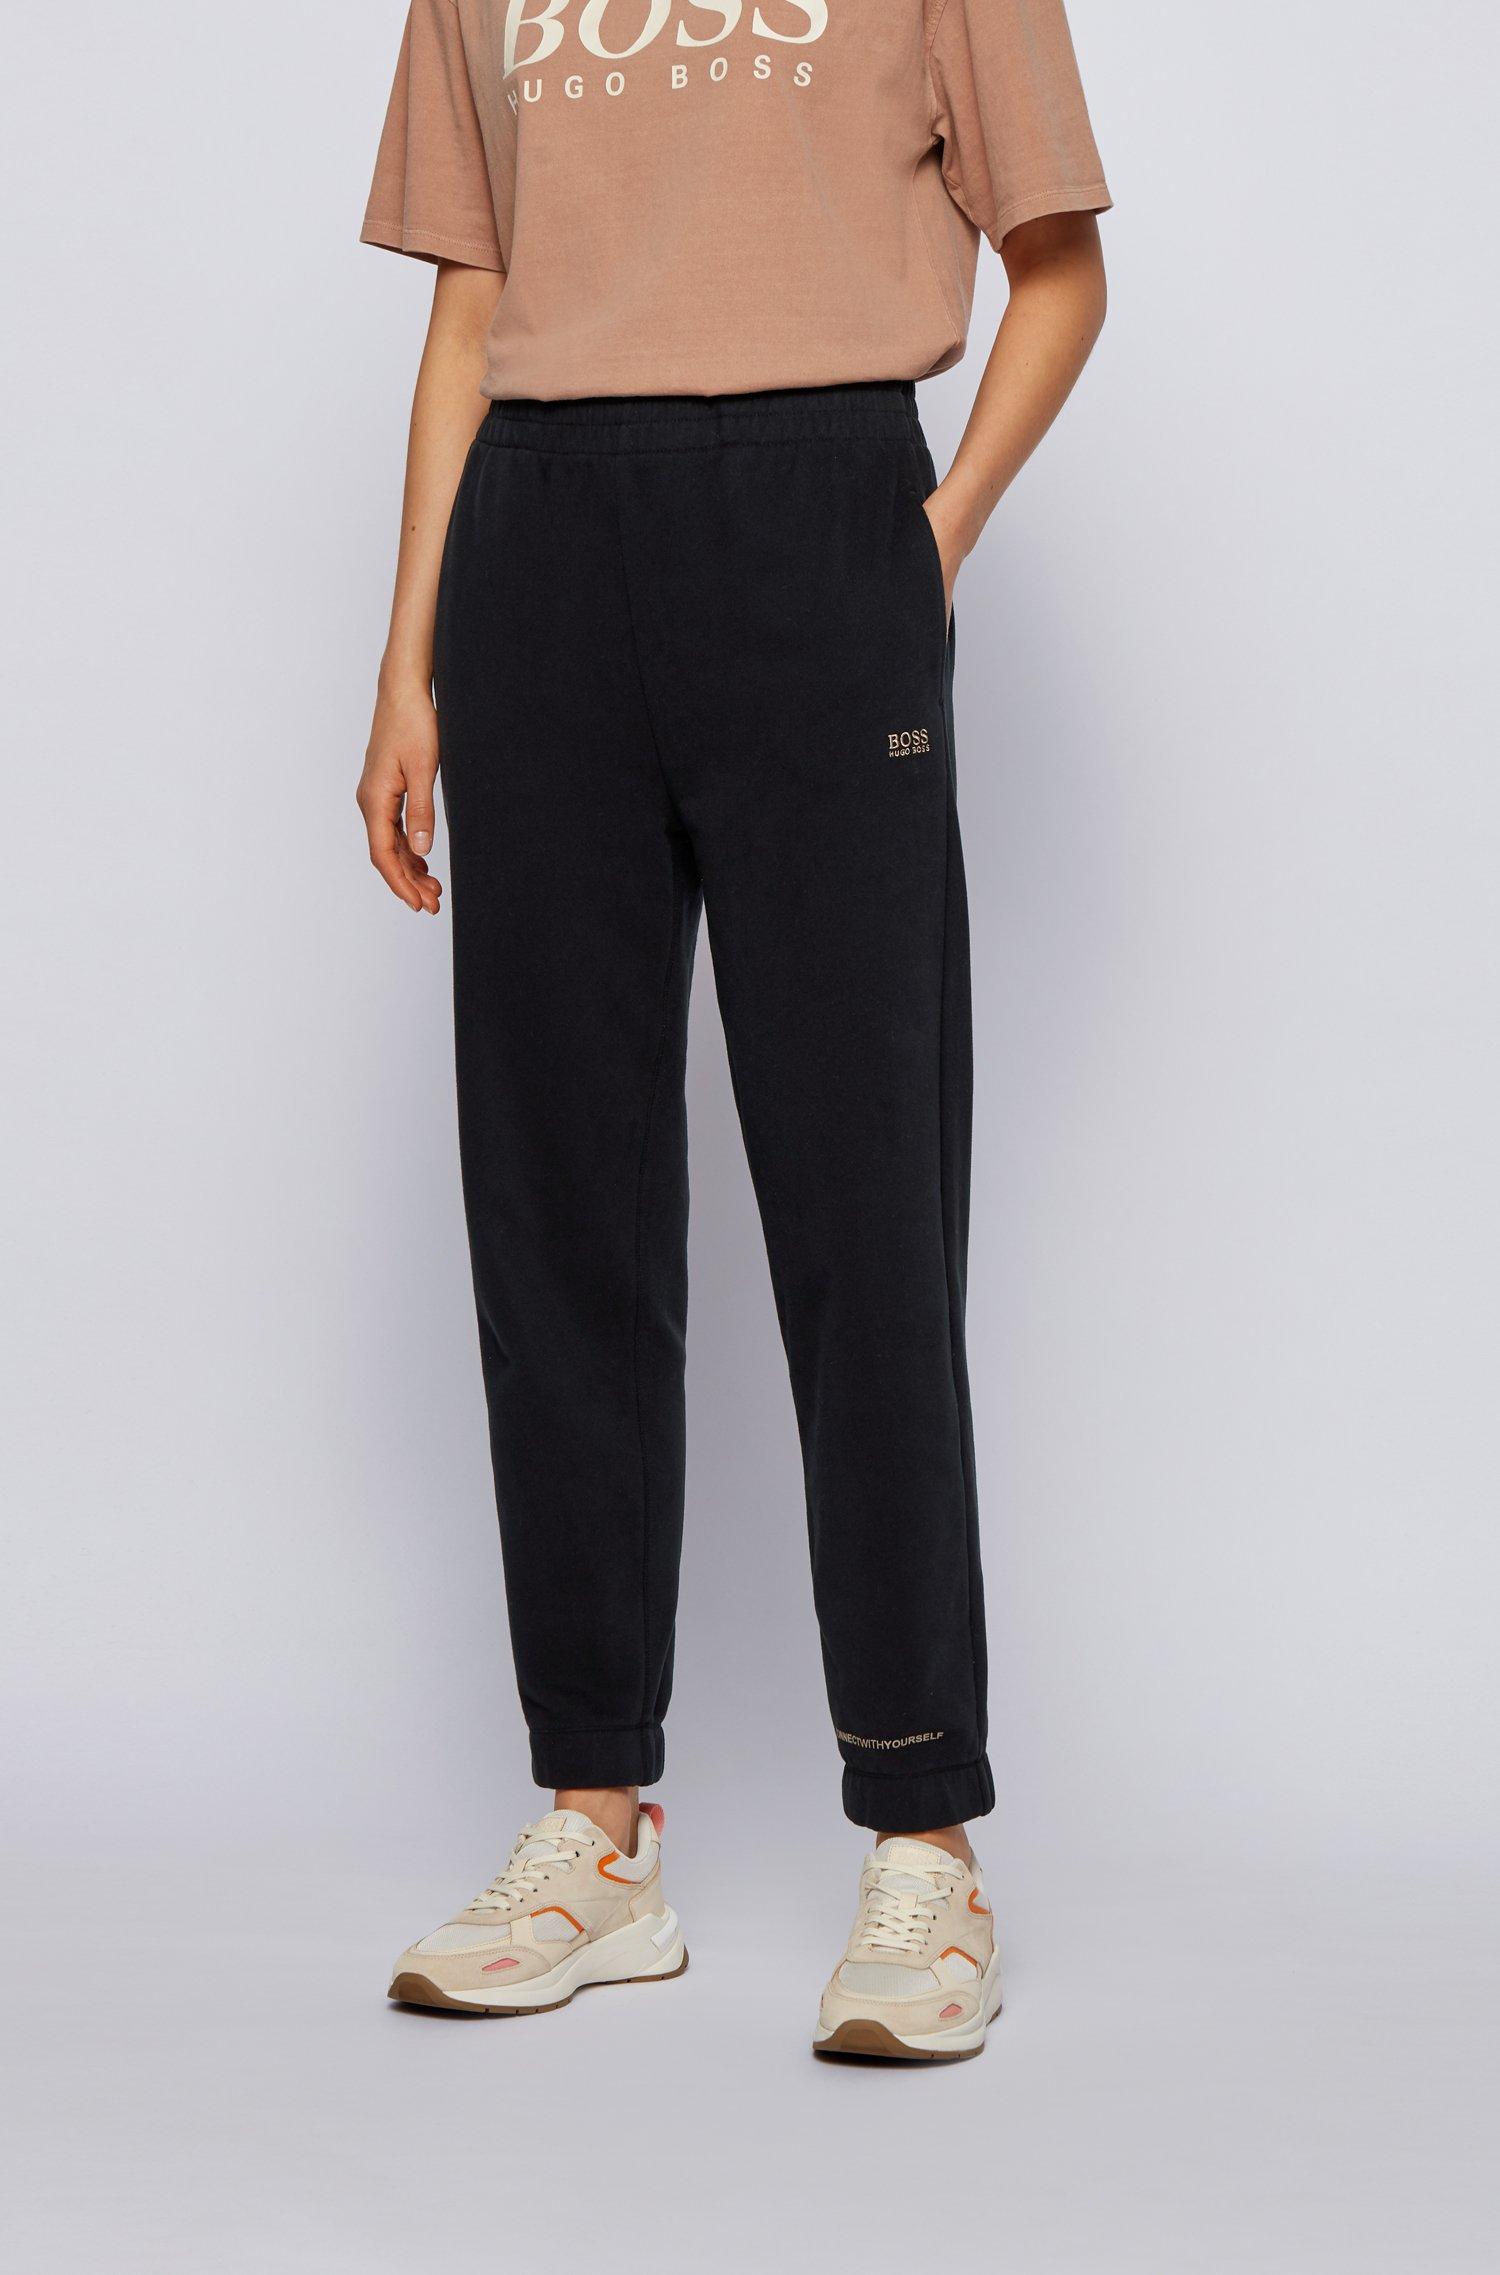 Cotton-blend tracksuit bottoms with logo print, Black